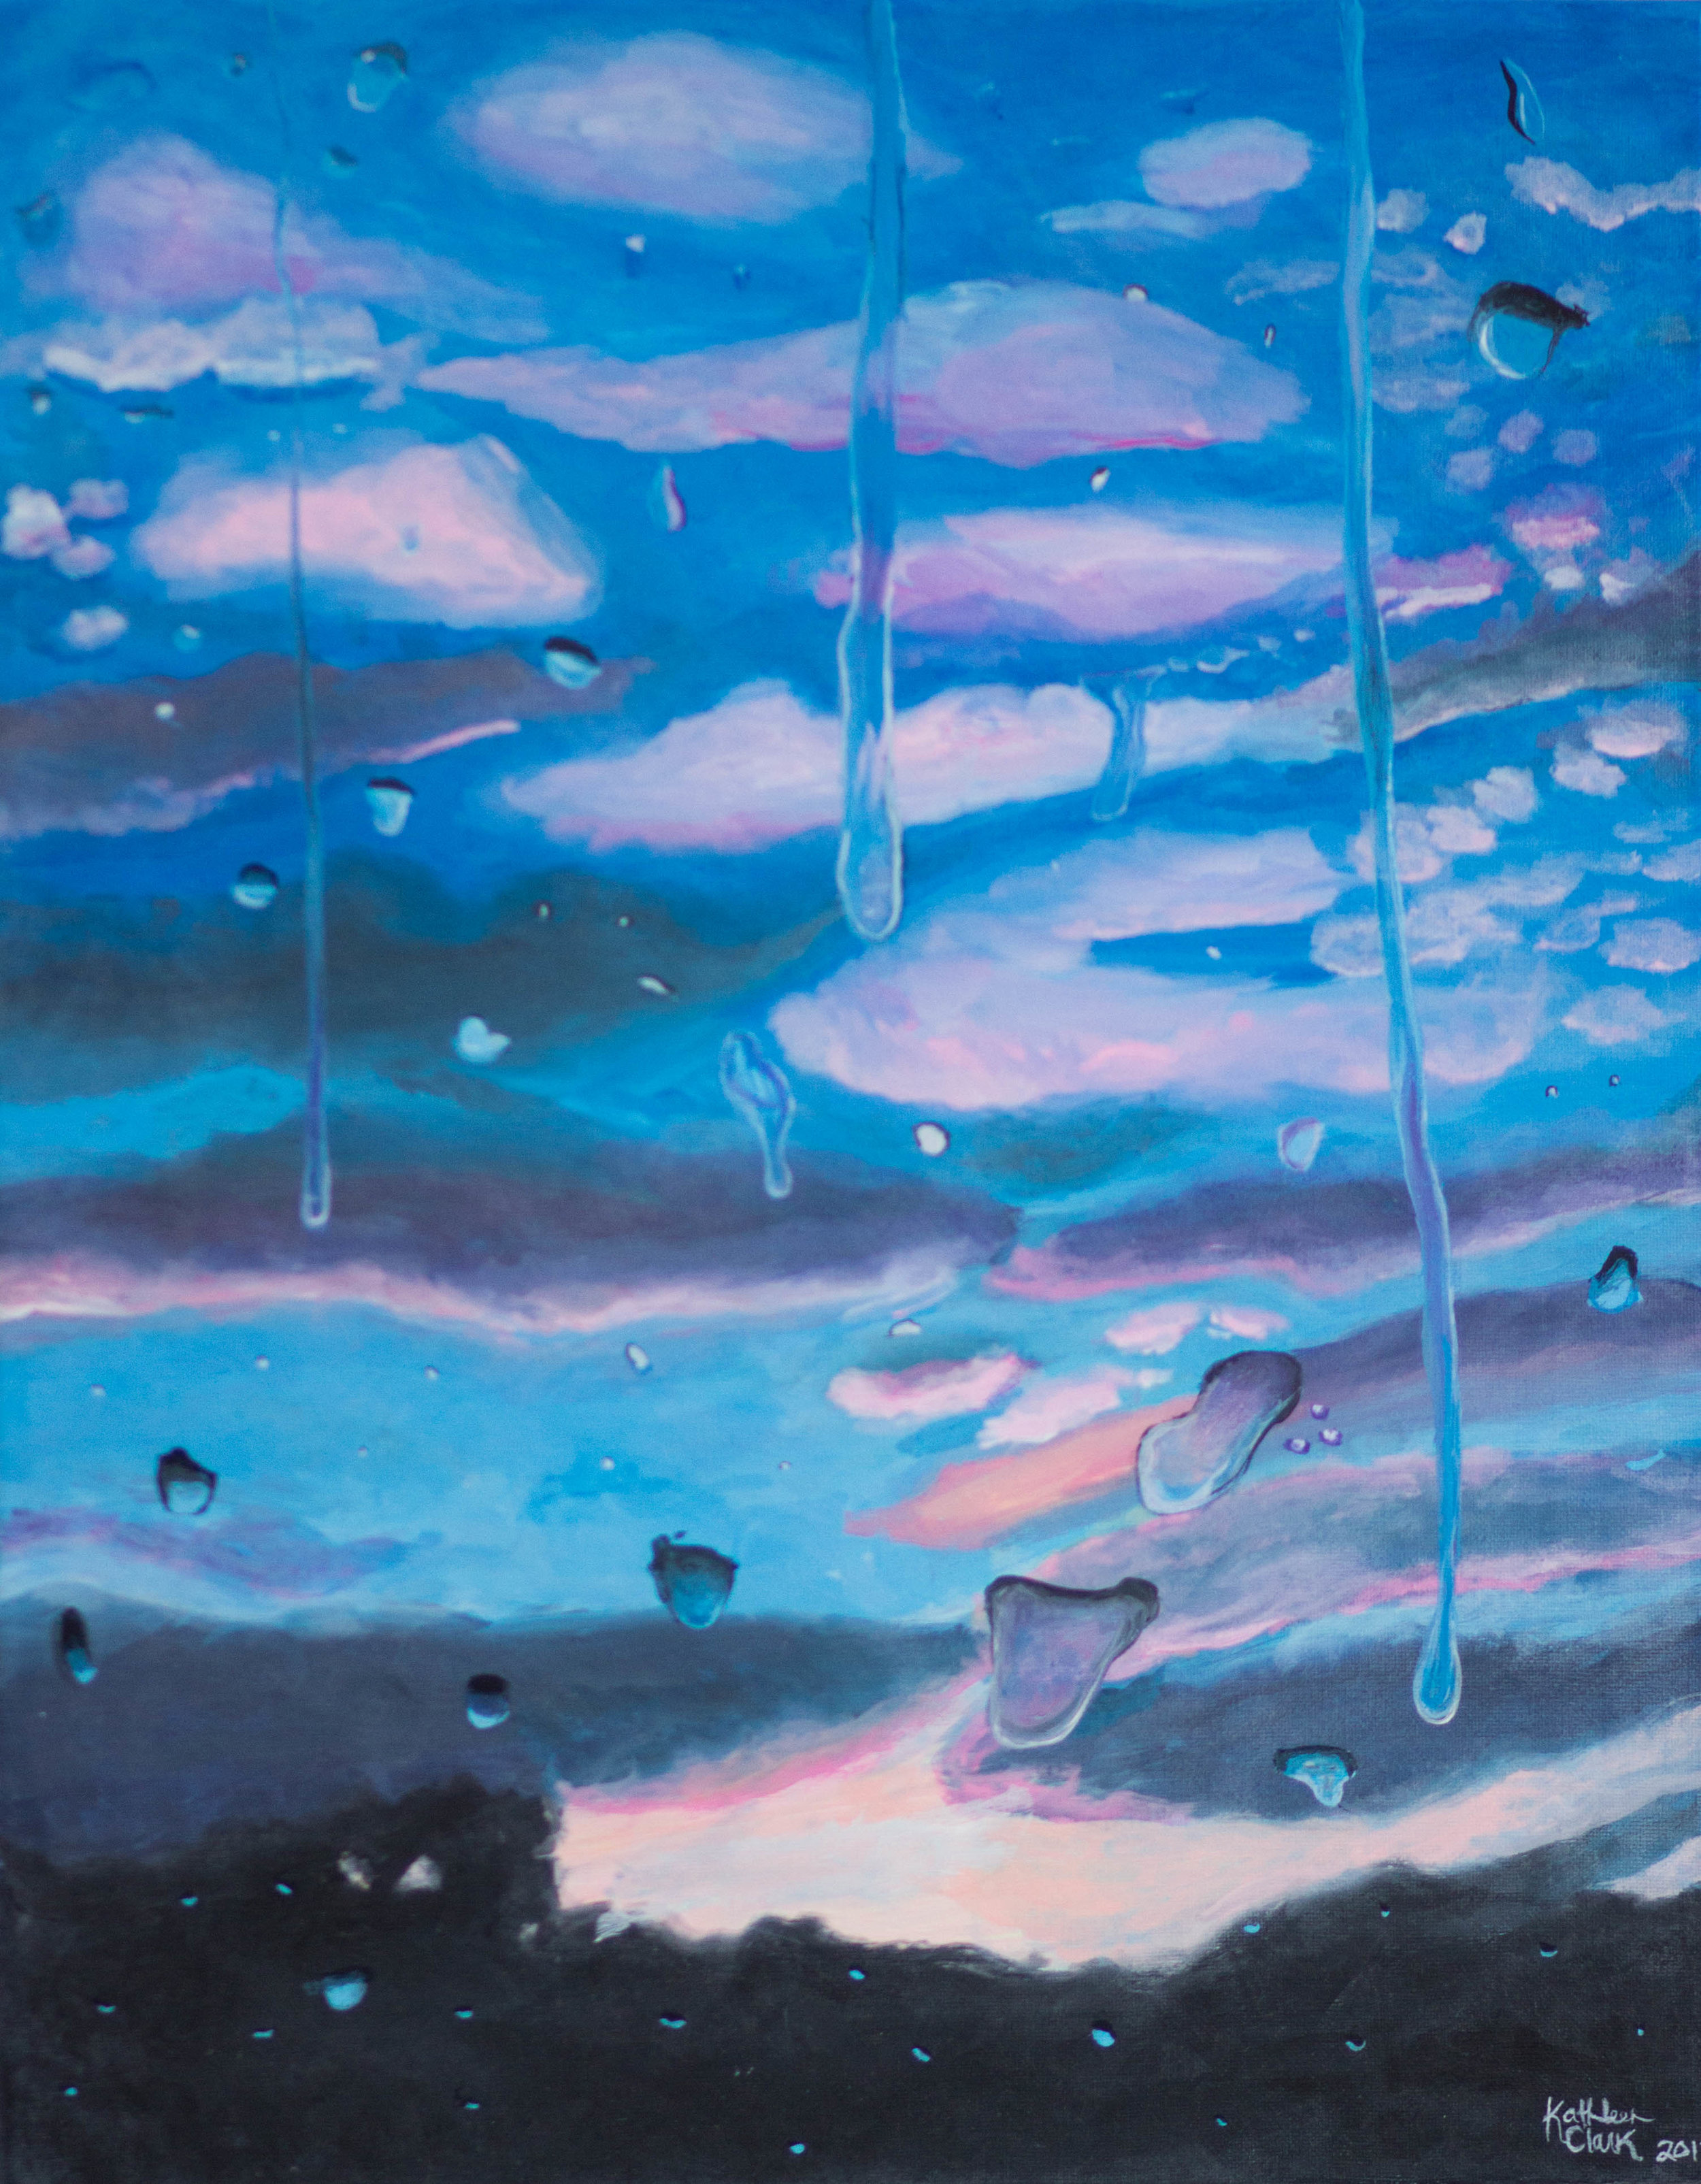 'Just Us' 16 x 20 acrylic on canvas